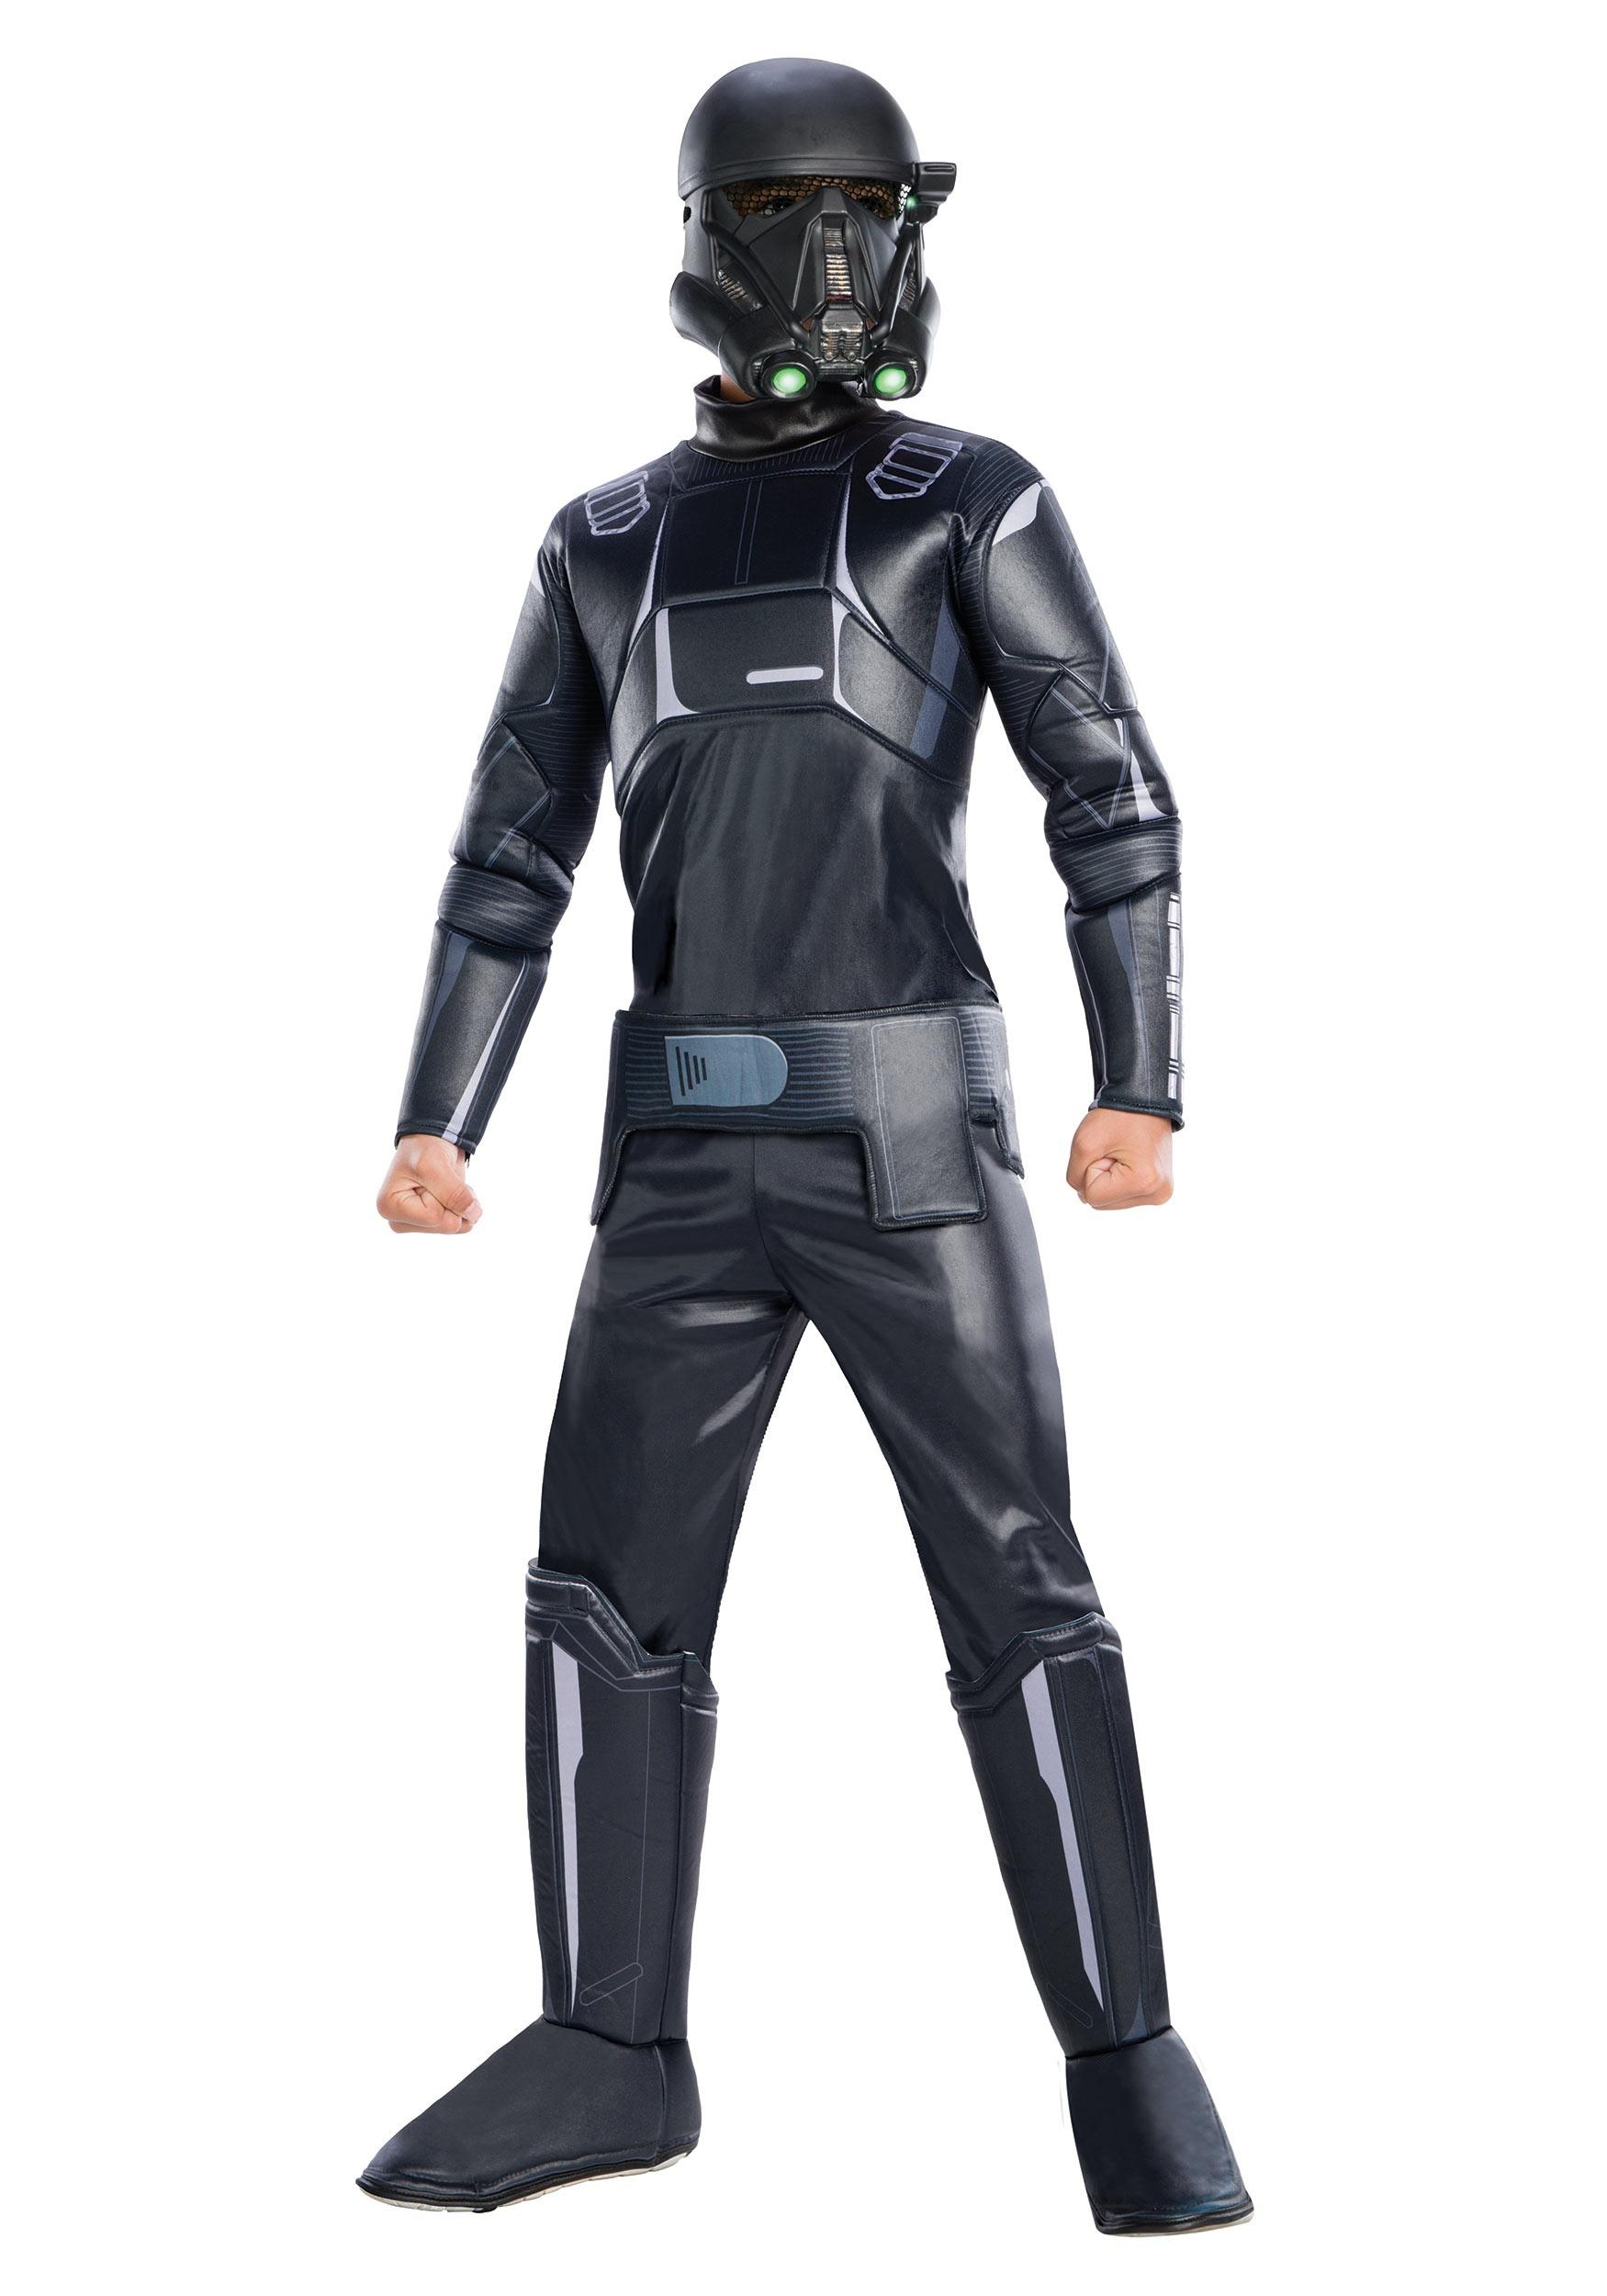 Star Wars The Mandalorian Death Trooper Costume for Boys